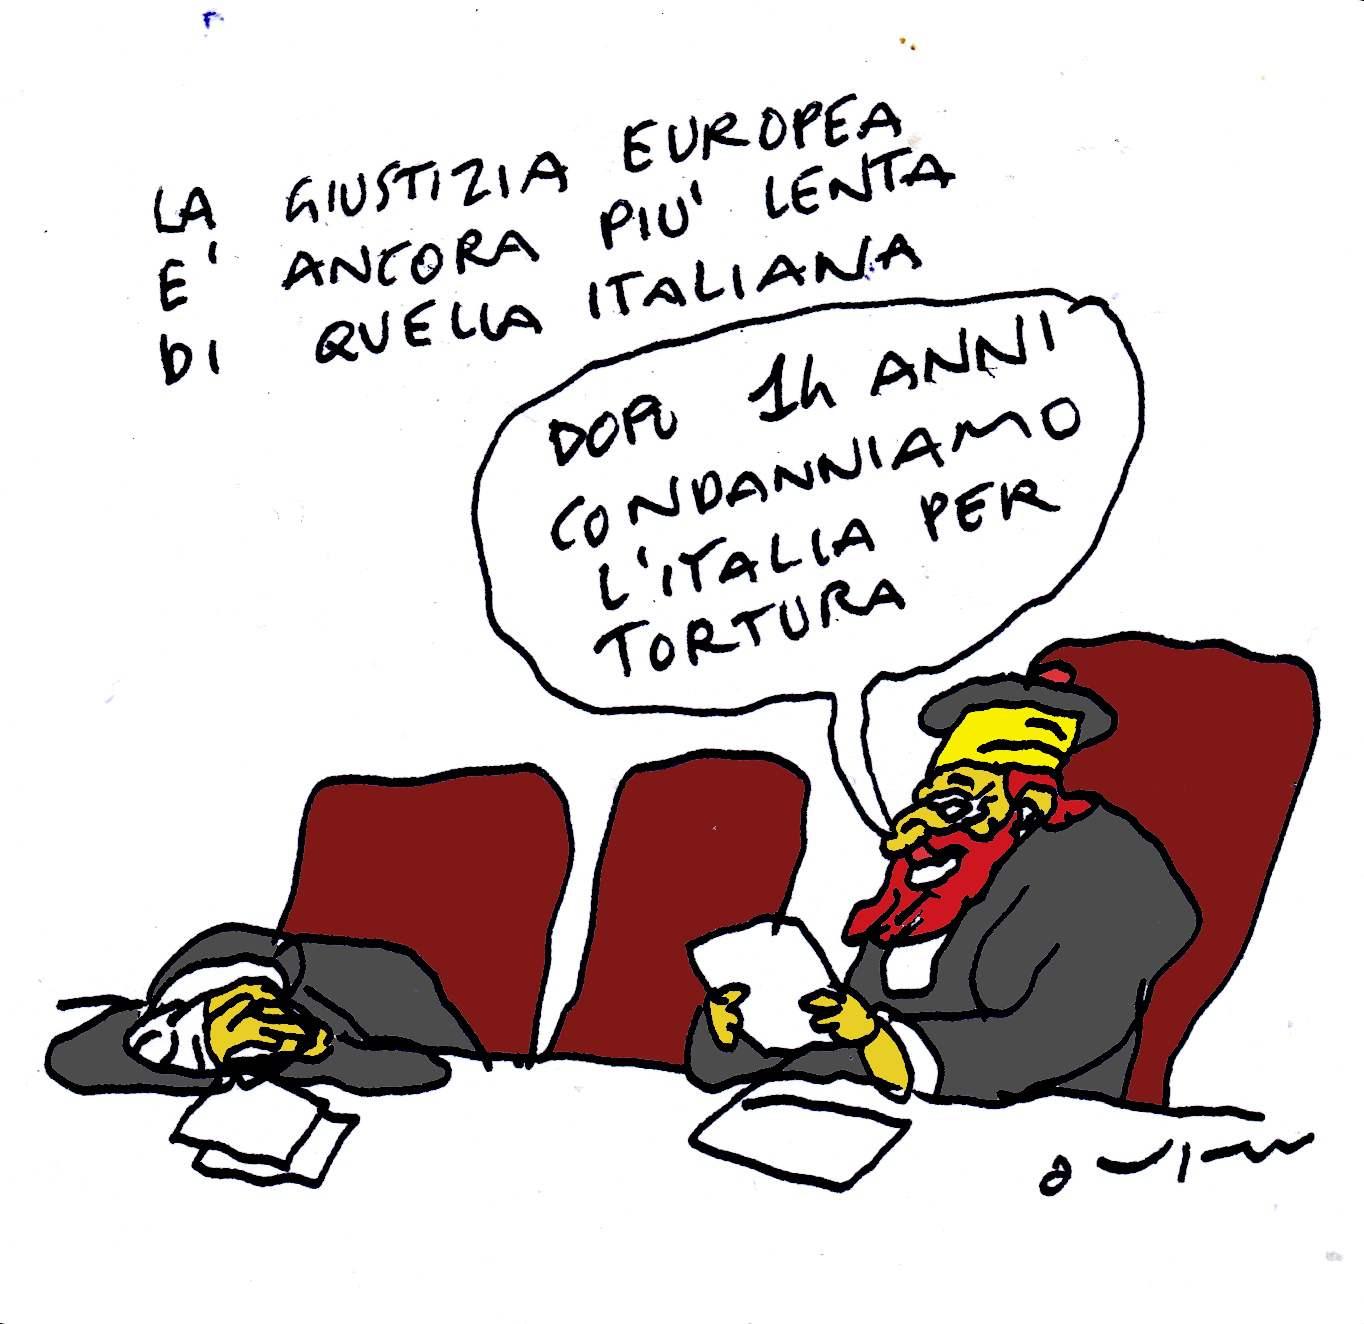 giustizia europea lentak